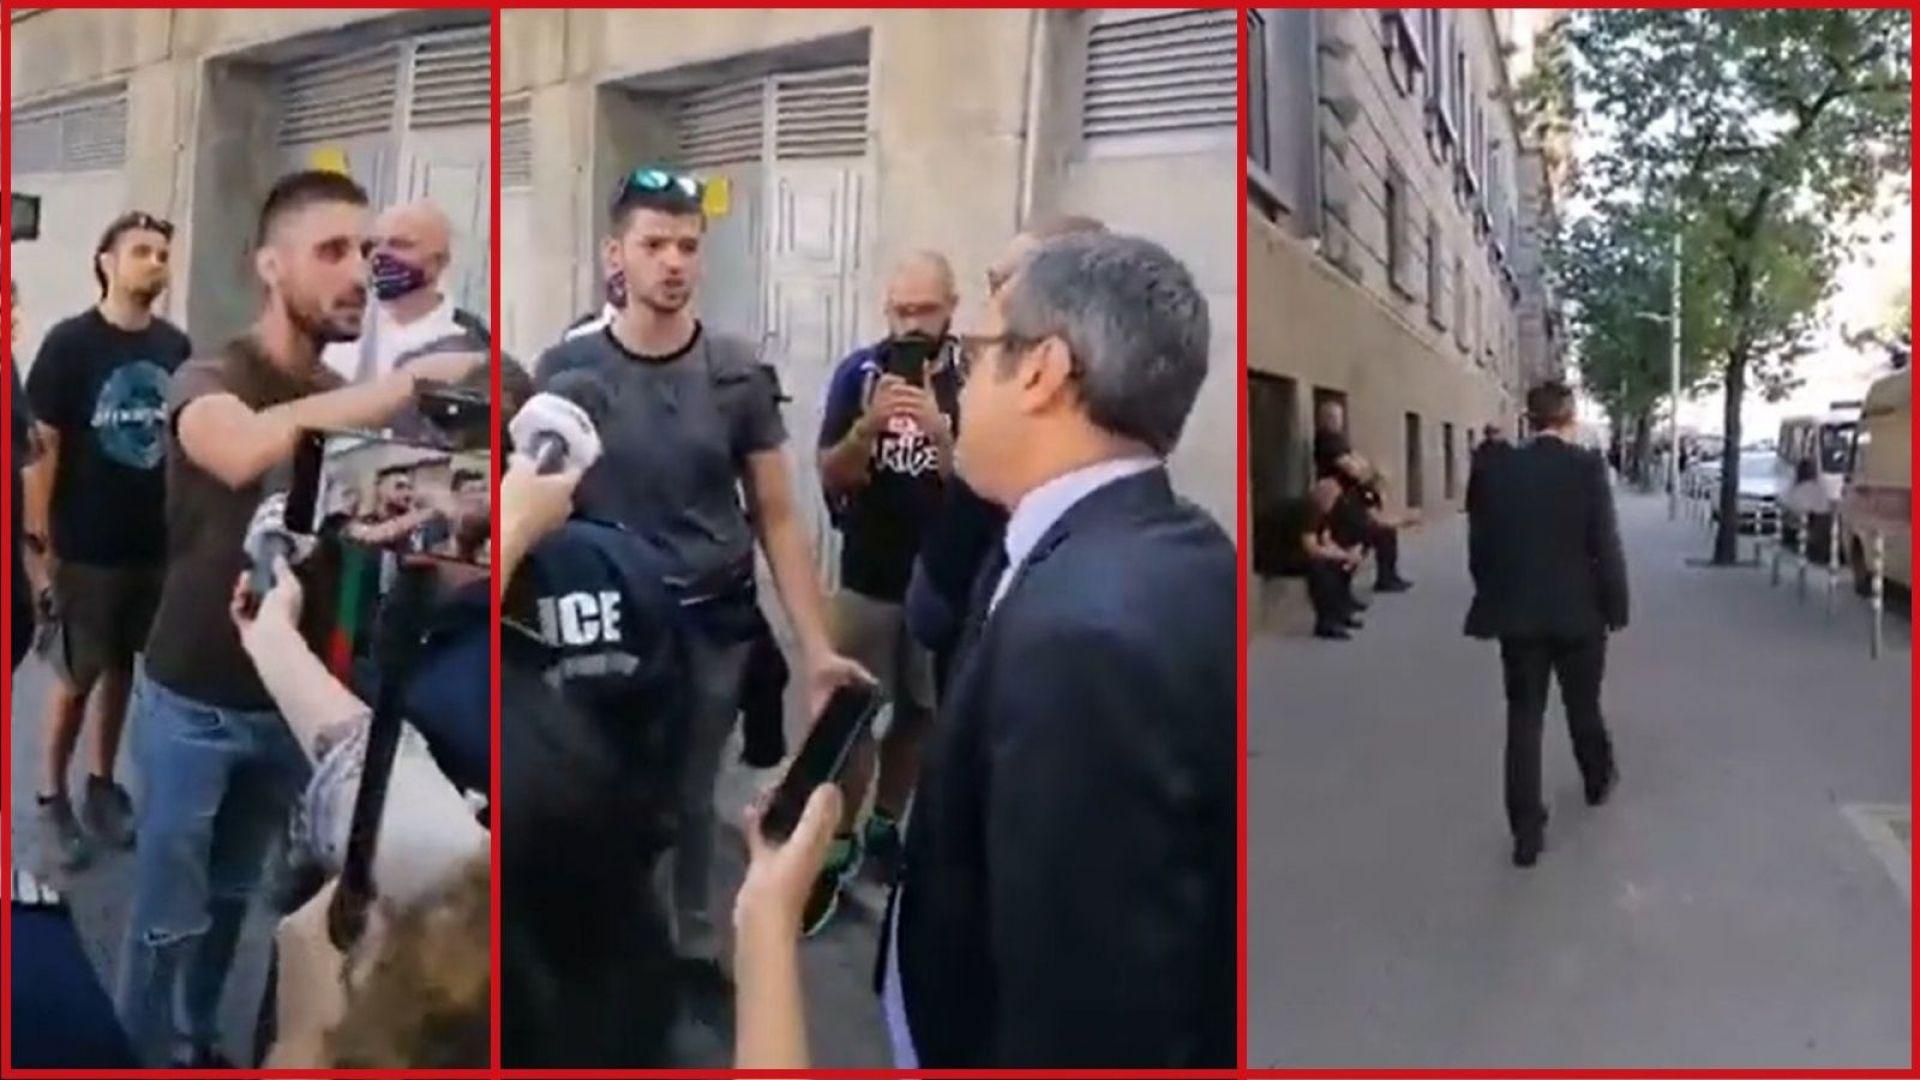 Тома Биков спори очи в очи с протестиращи (видео)